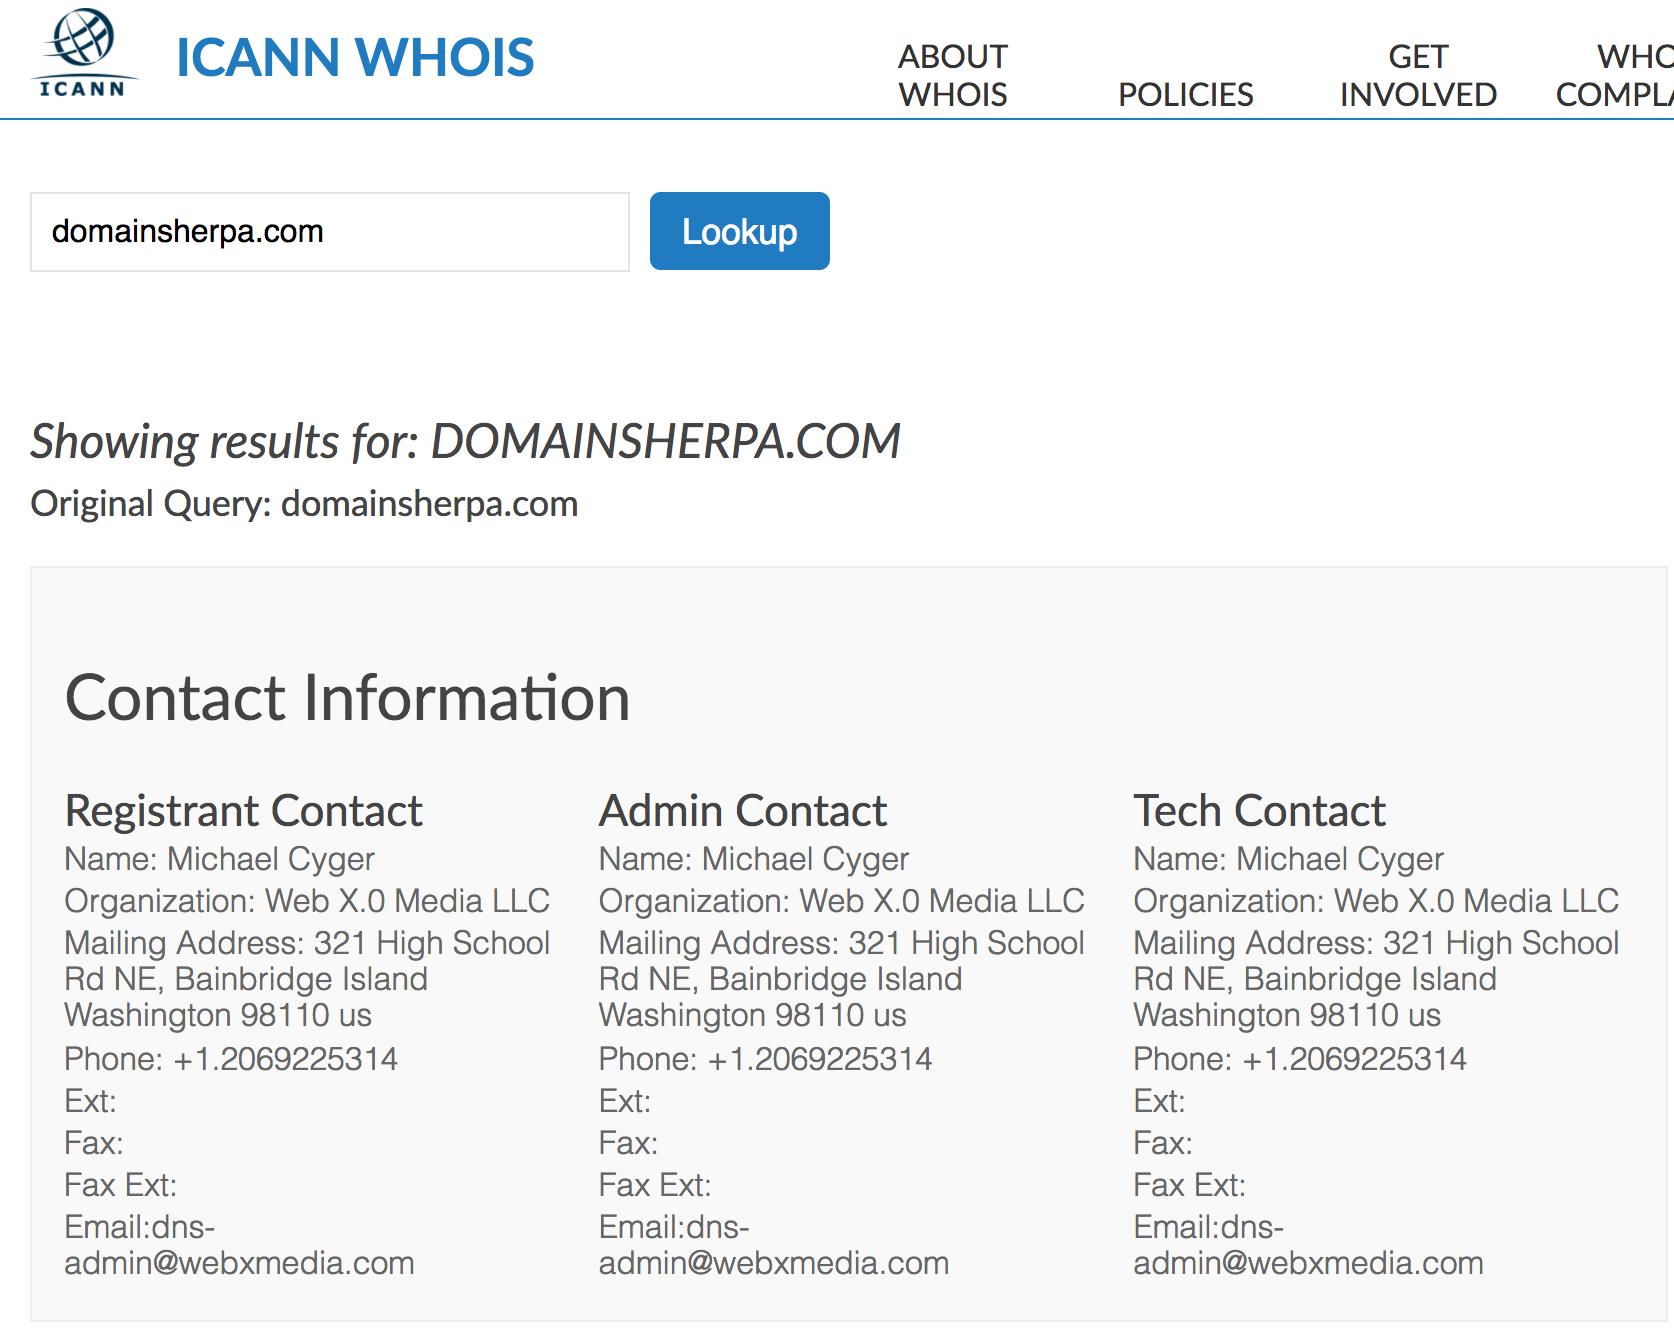 GoDaddy Stole My Domain!